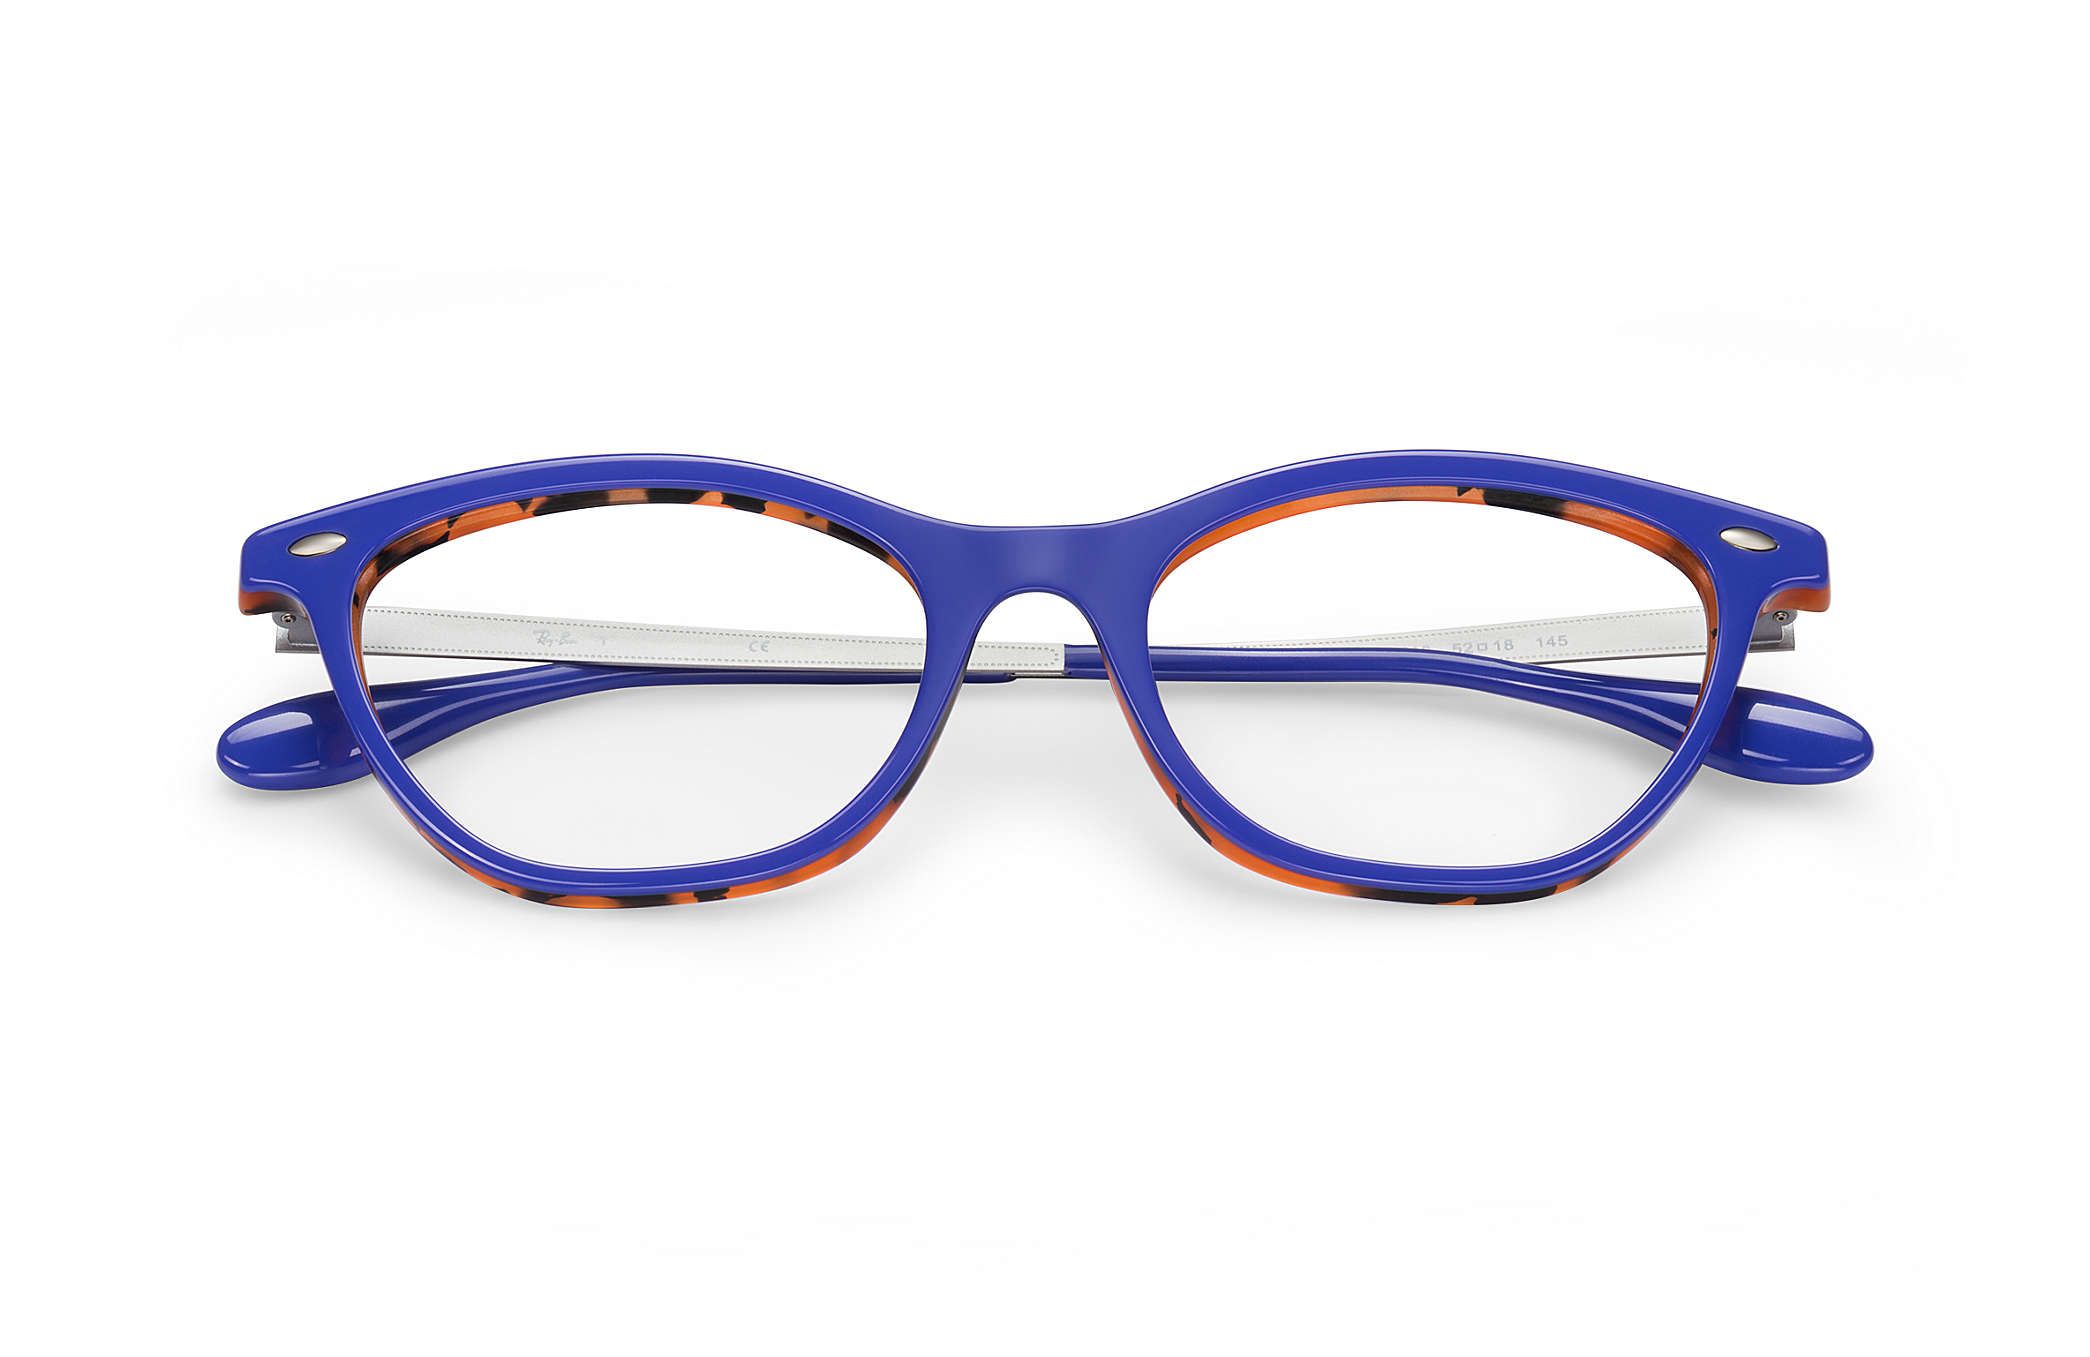 713225c10f8 Ray-Ban eyeglasses RB5360 Blue - Acetate - 0RX5360571652